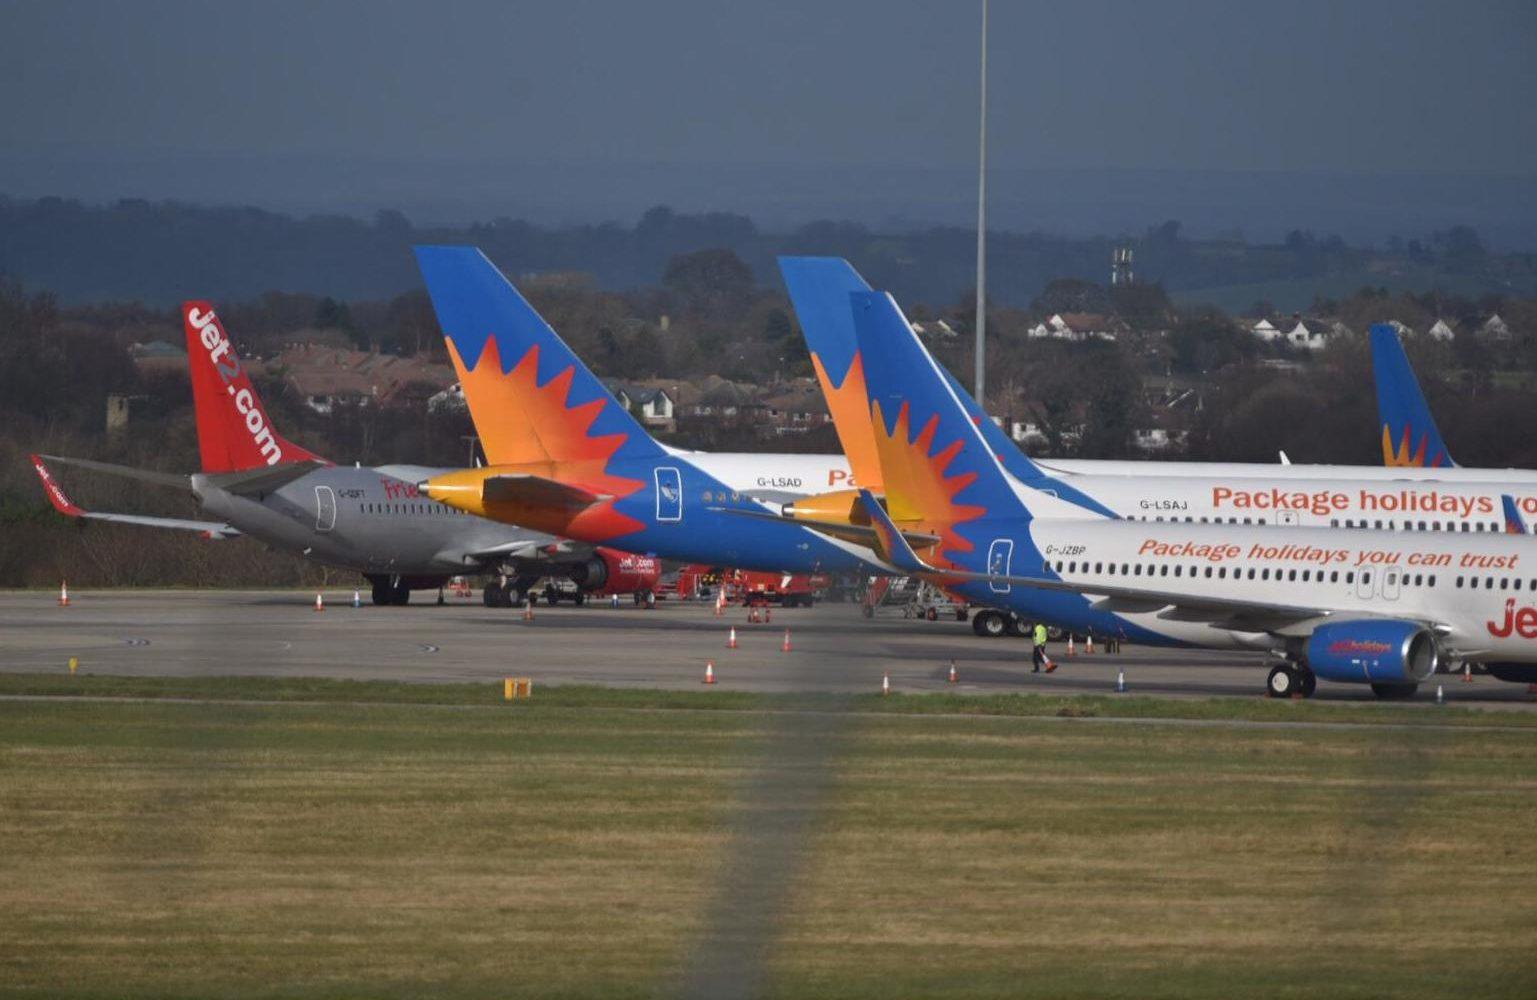 Leeds Bradford Airport flights near zero